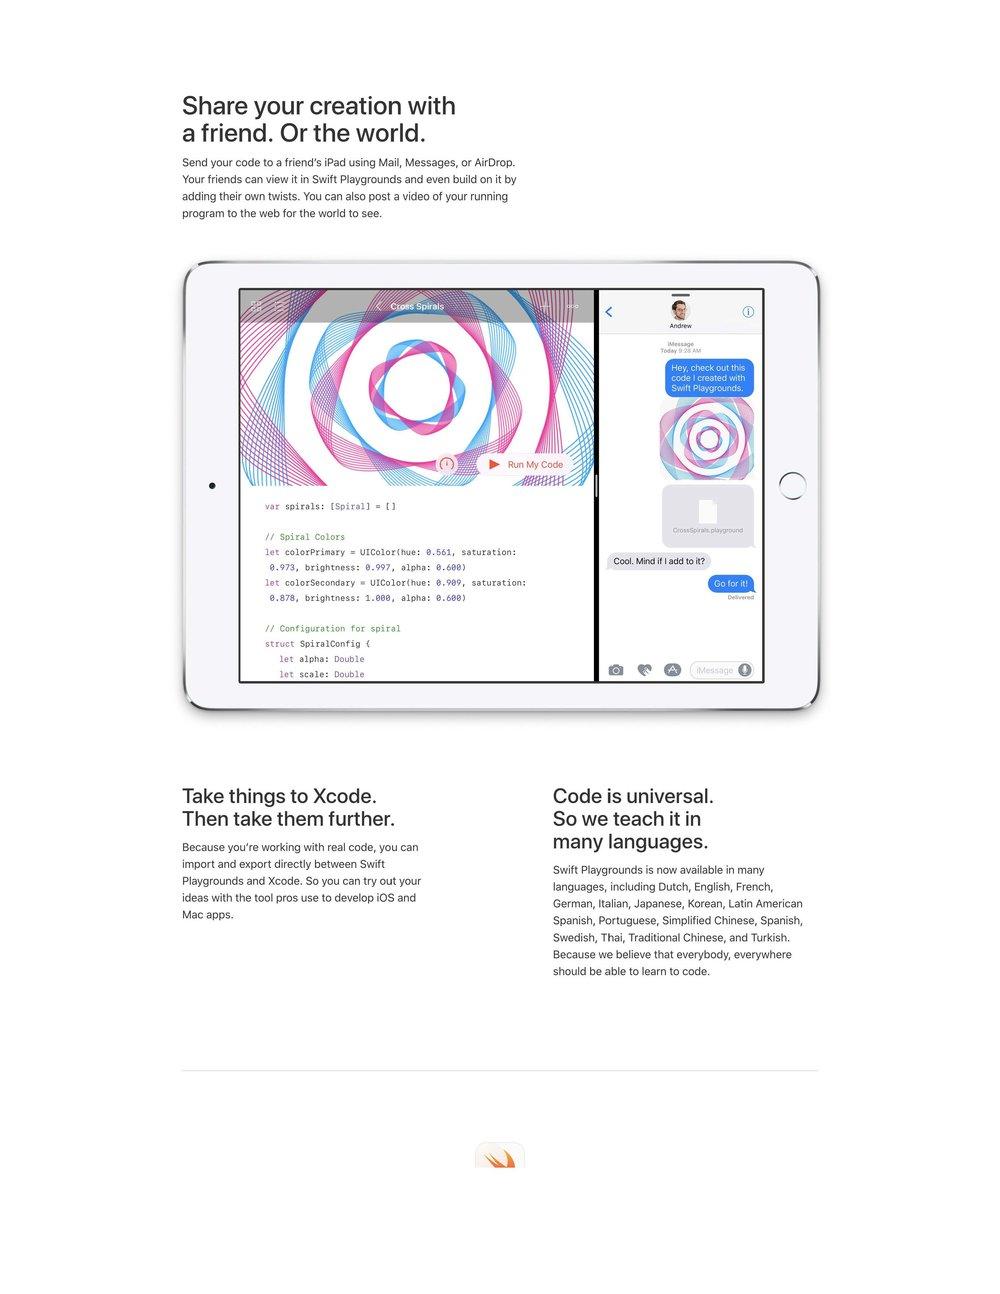 screencapture-apple-swift-playgrounds-2019-03-10-12_50_37_Page_8.jpg